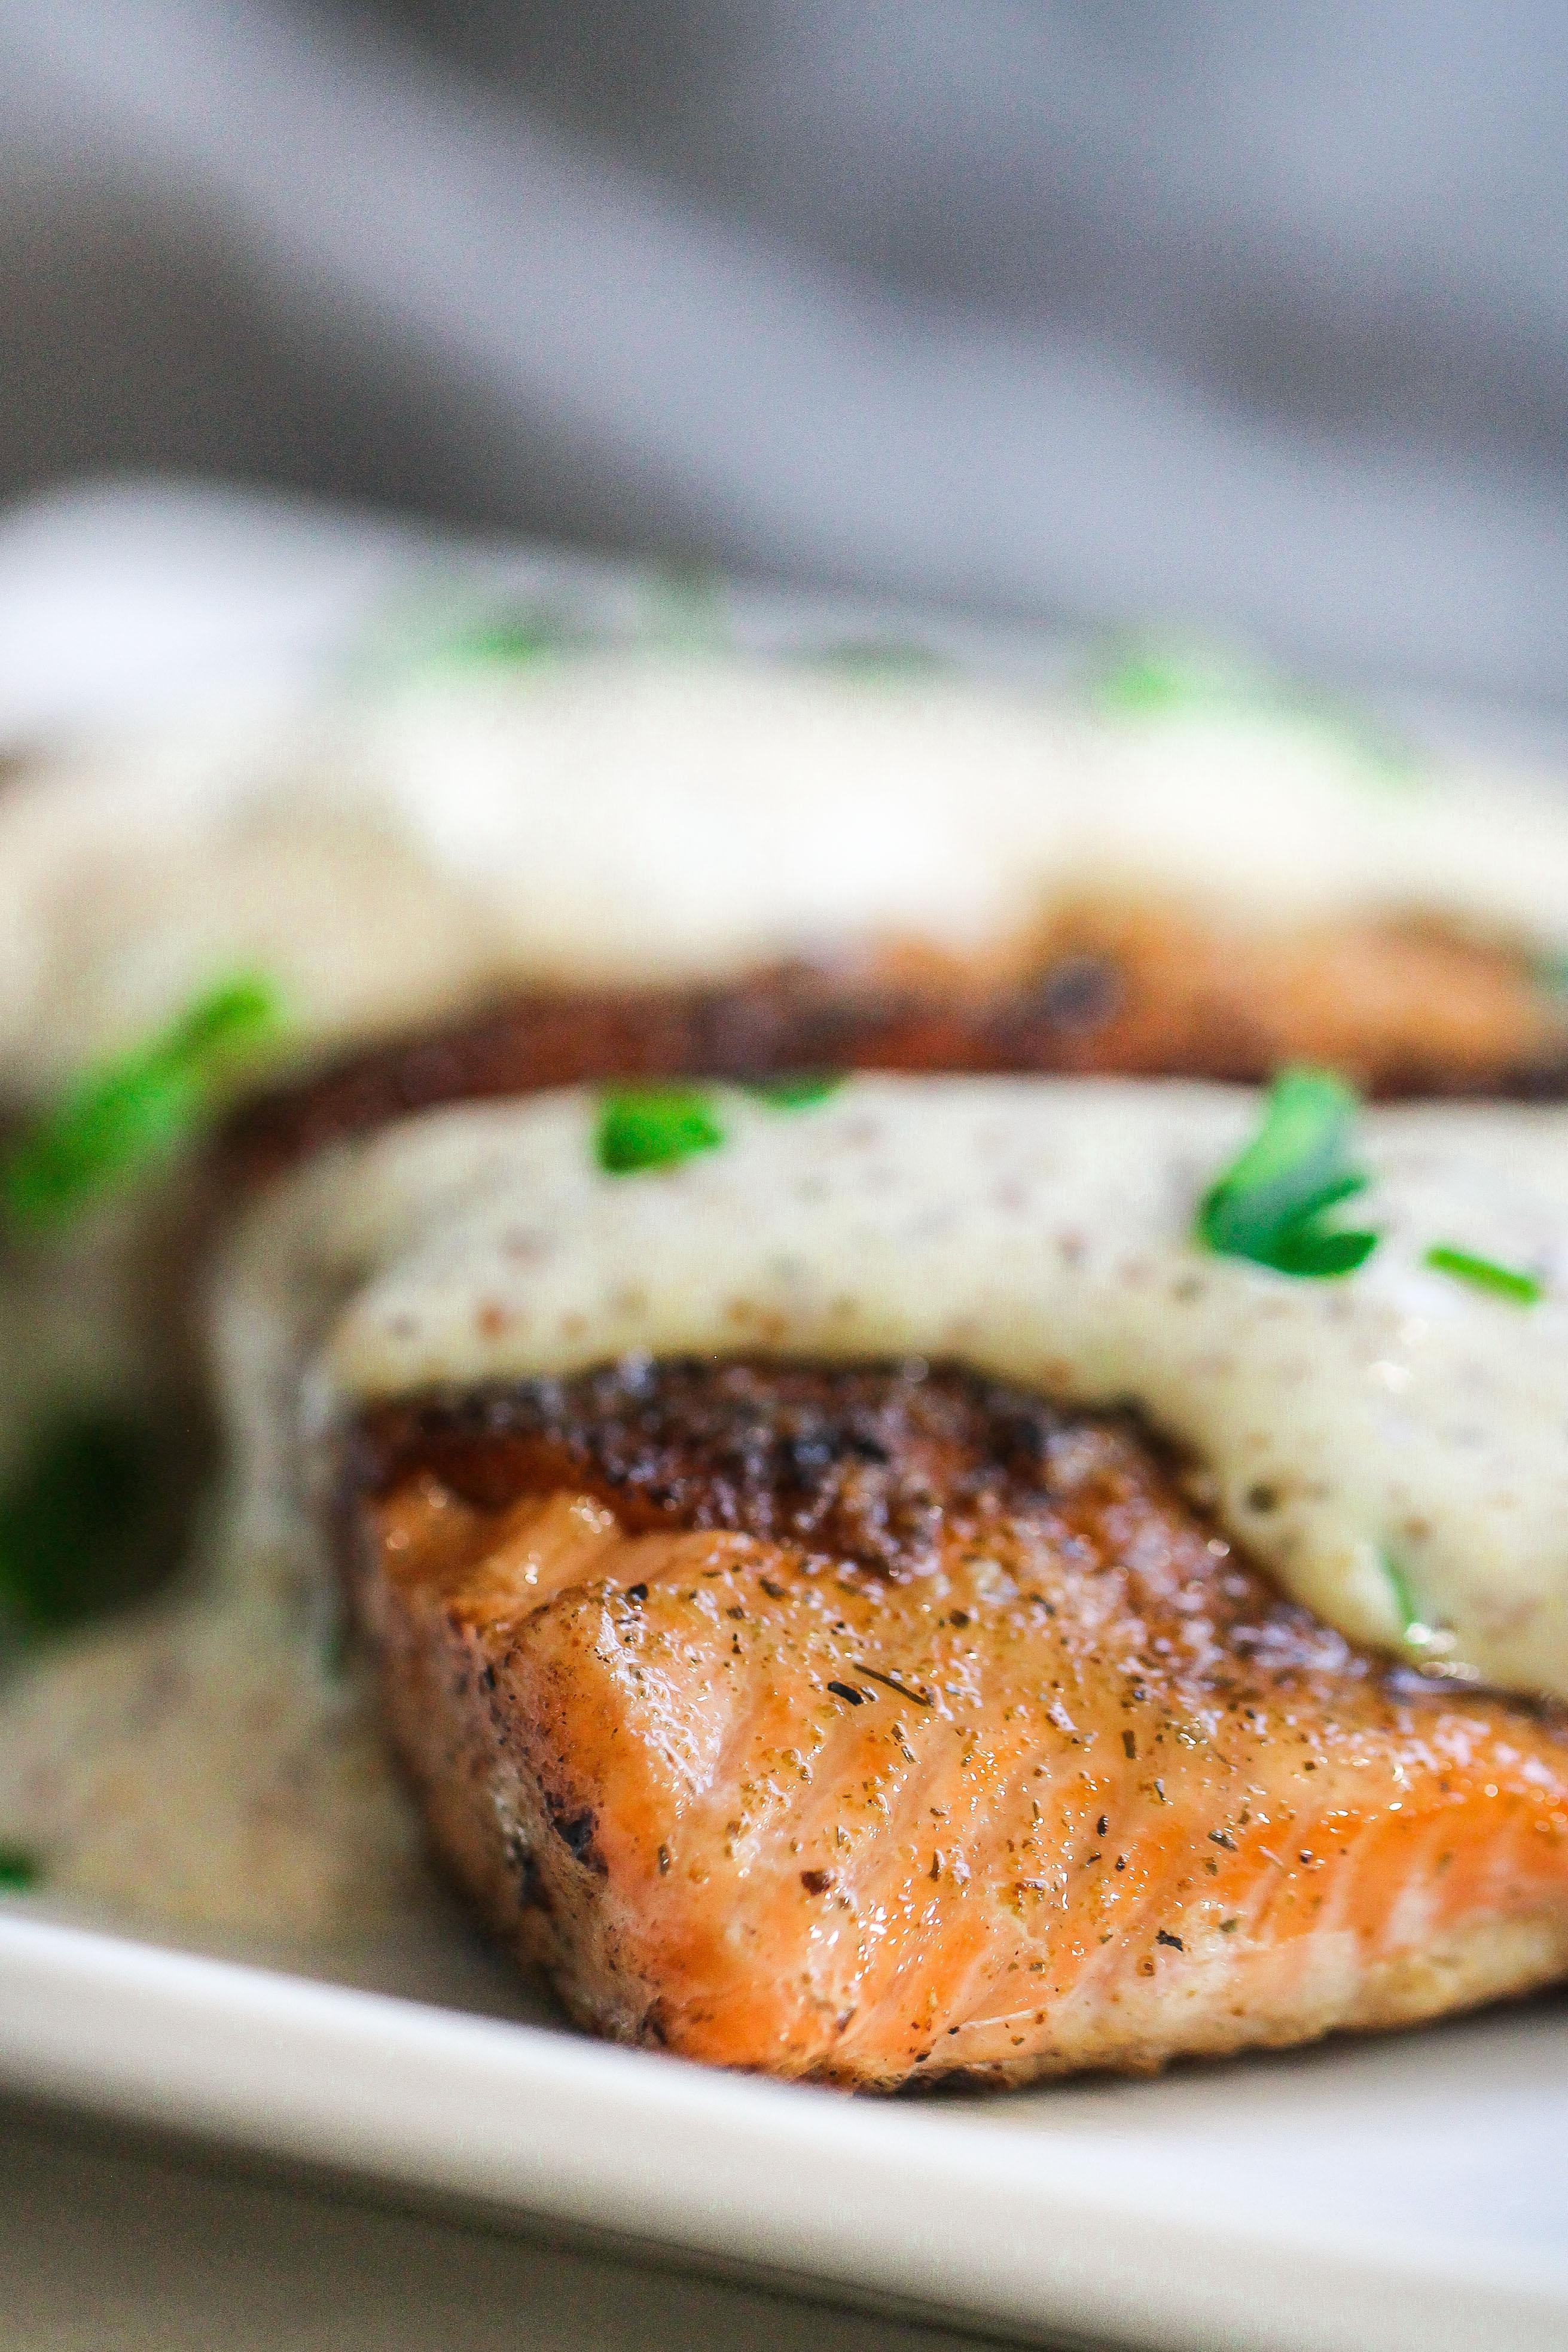 Savory Salmon with Tangy Horseradish Sauce